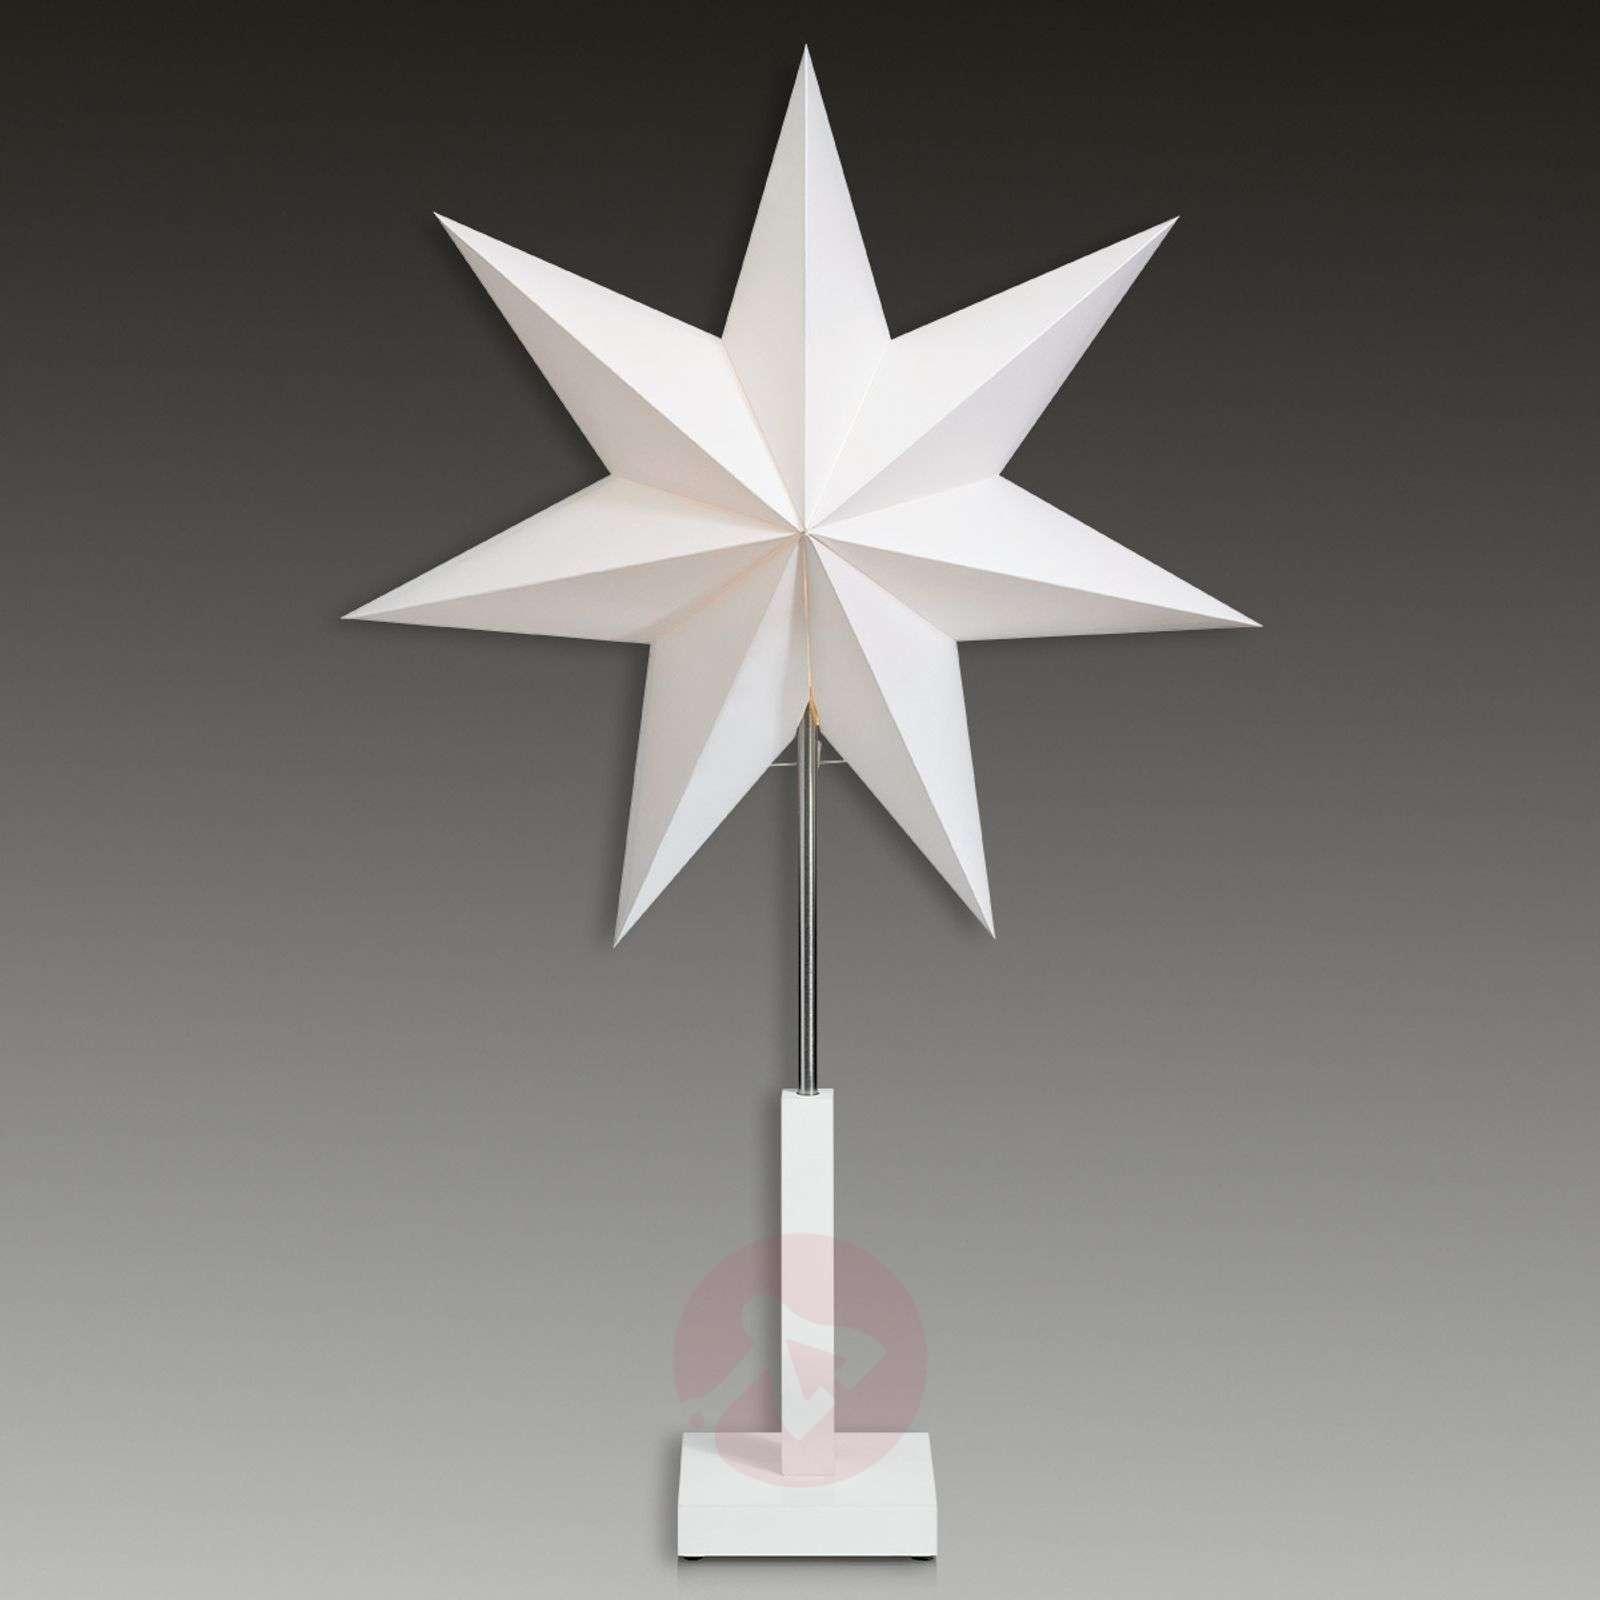 45 cm wide decorative light Duva-6507358-01